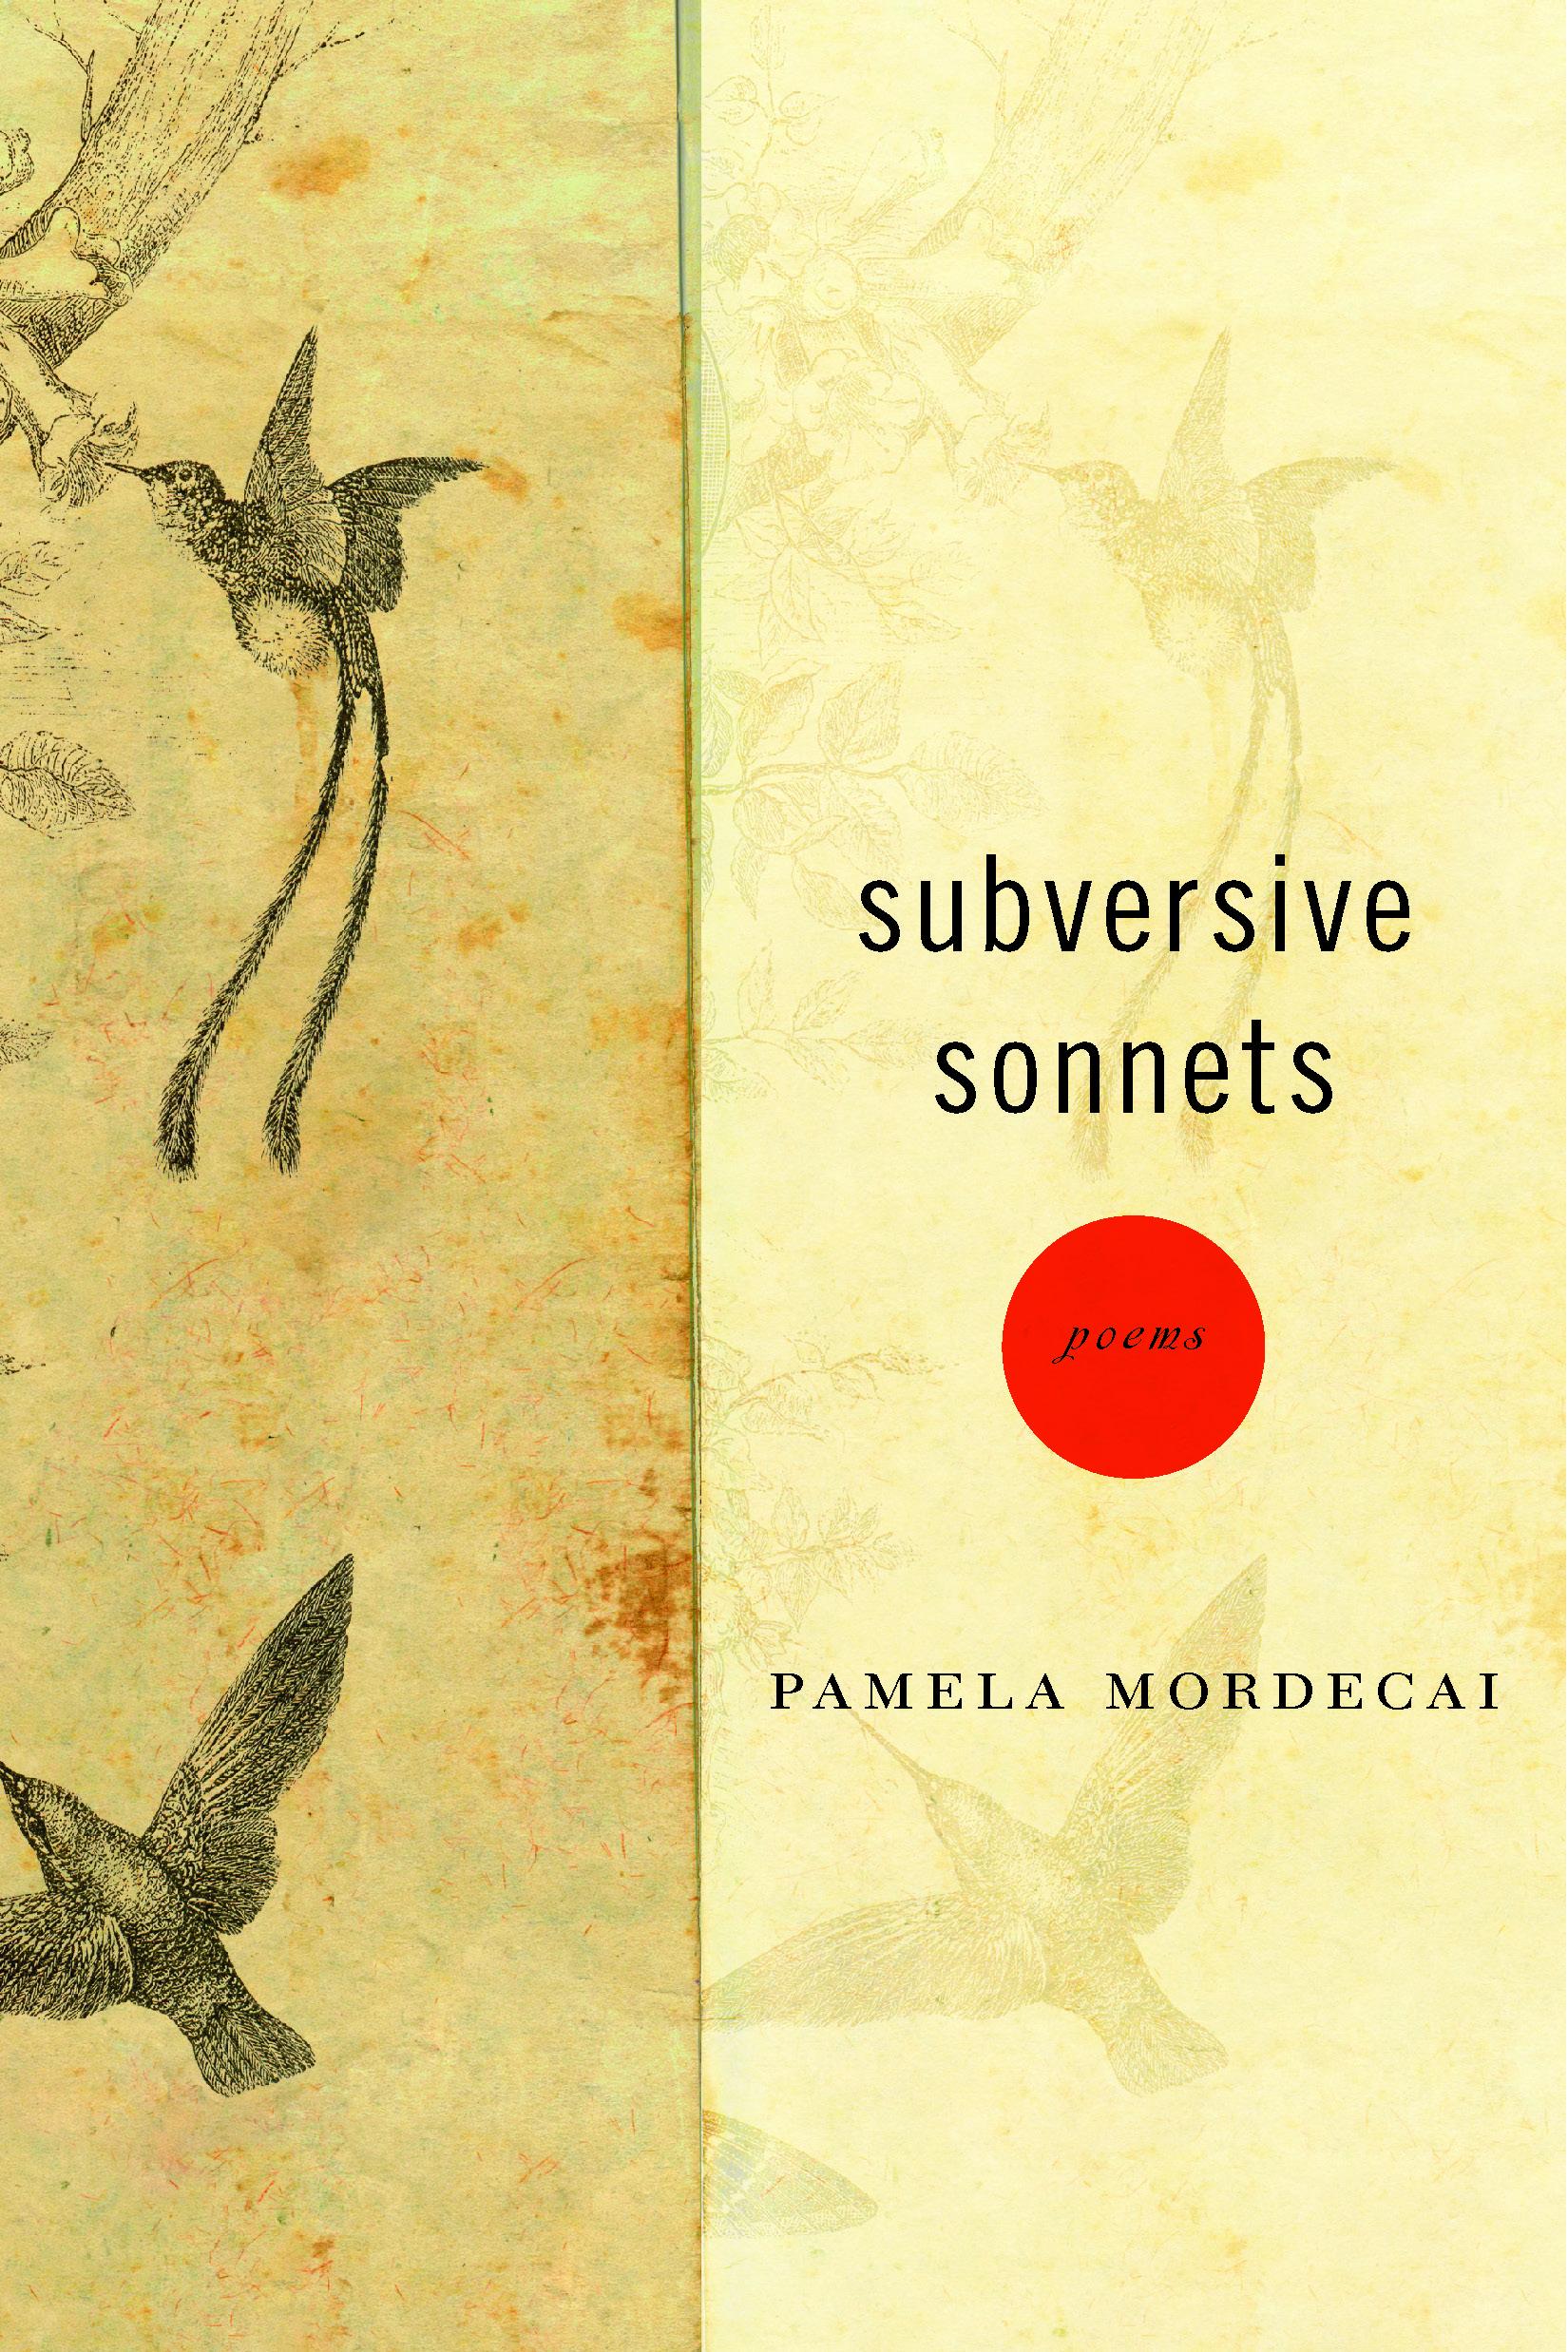 SubversiveSonnets